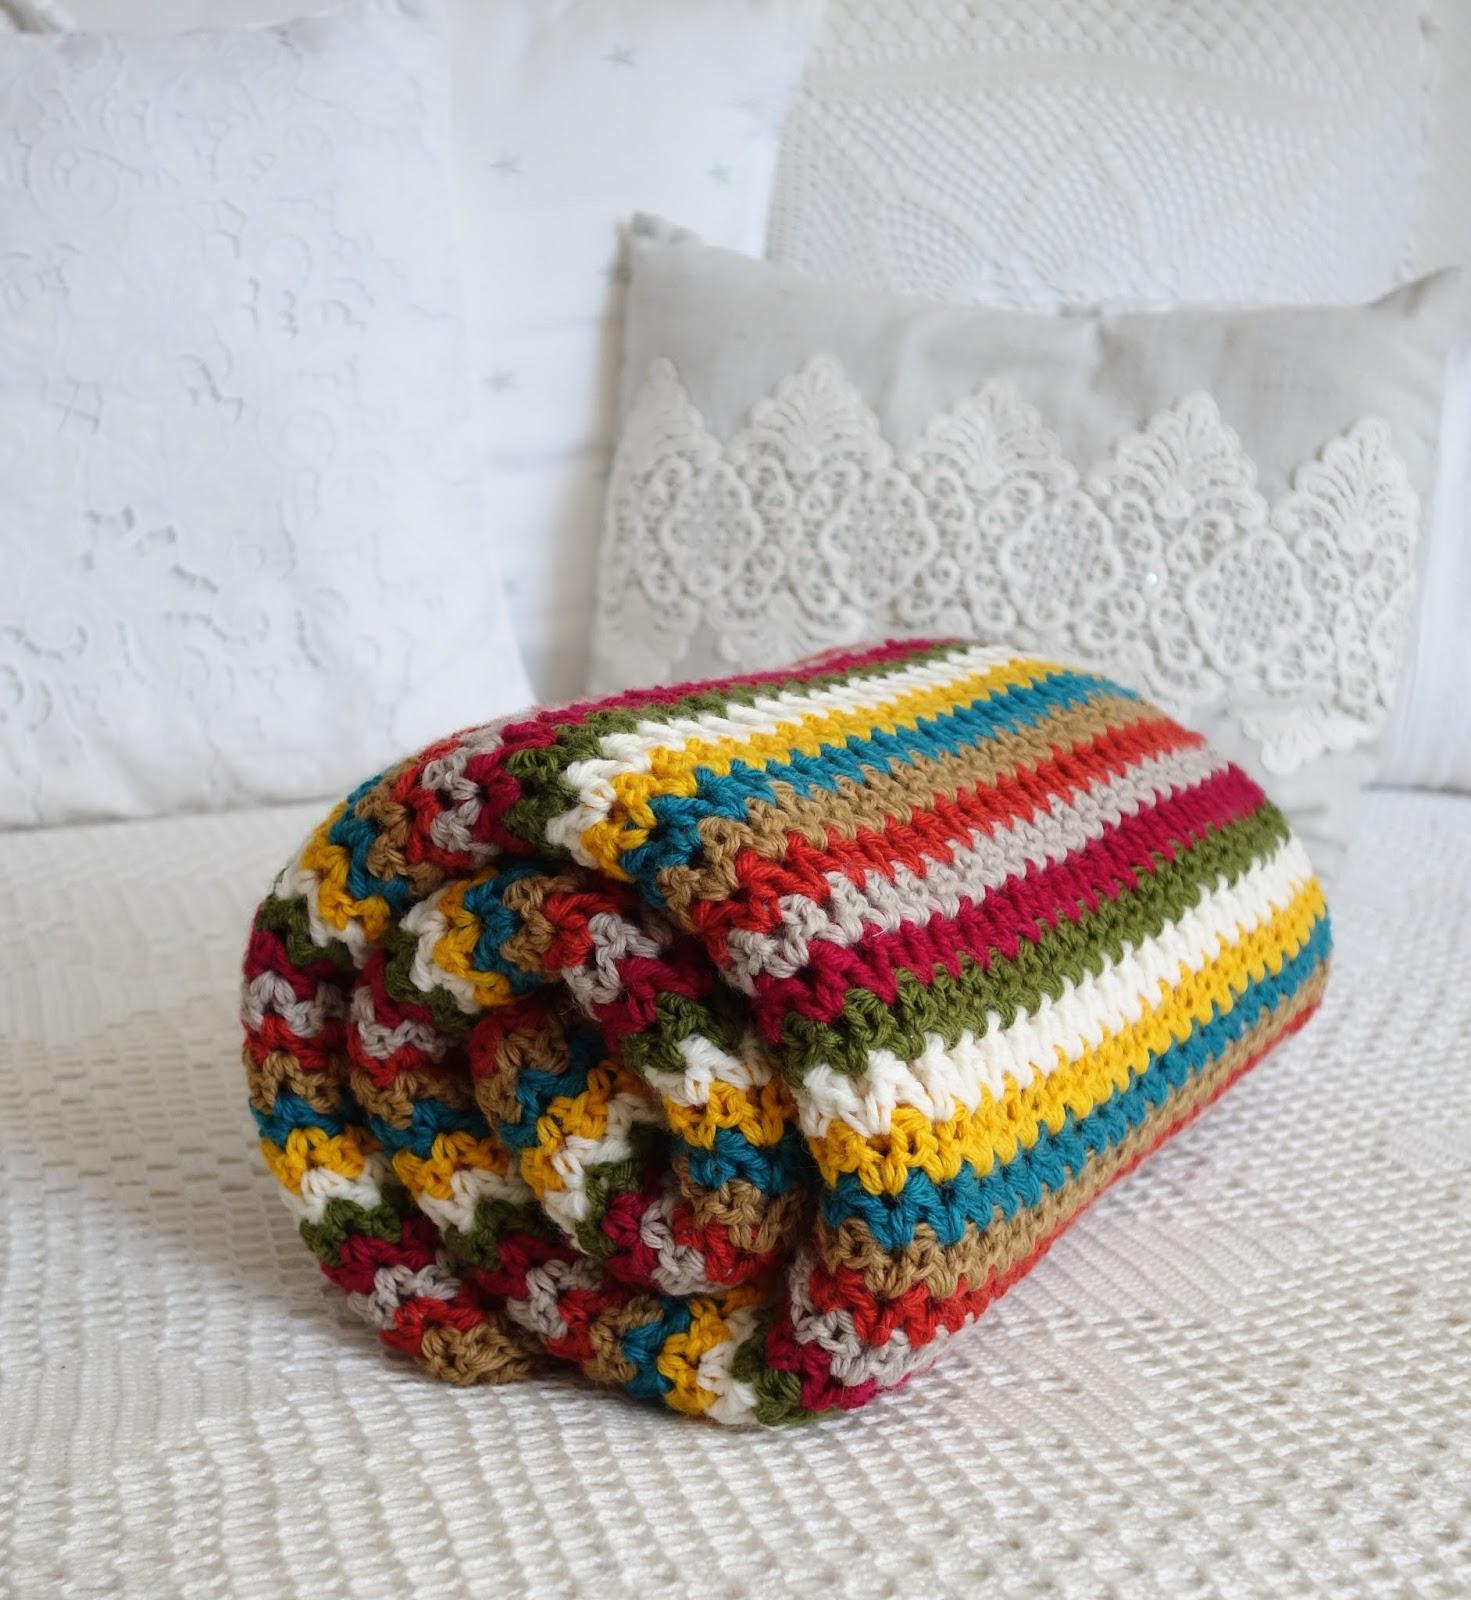 The Crochet Factor